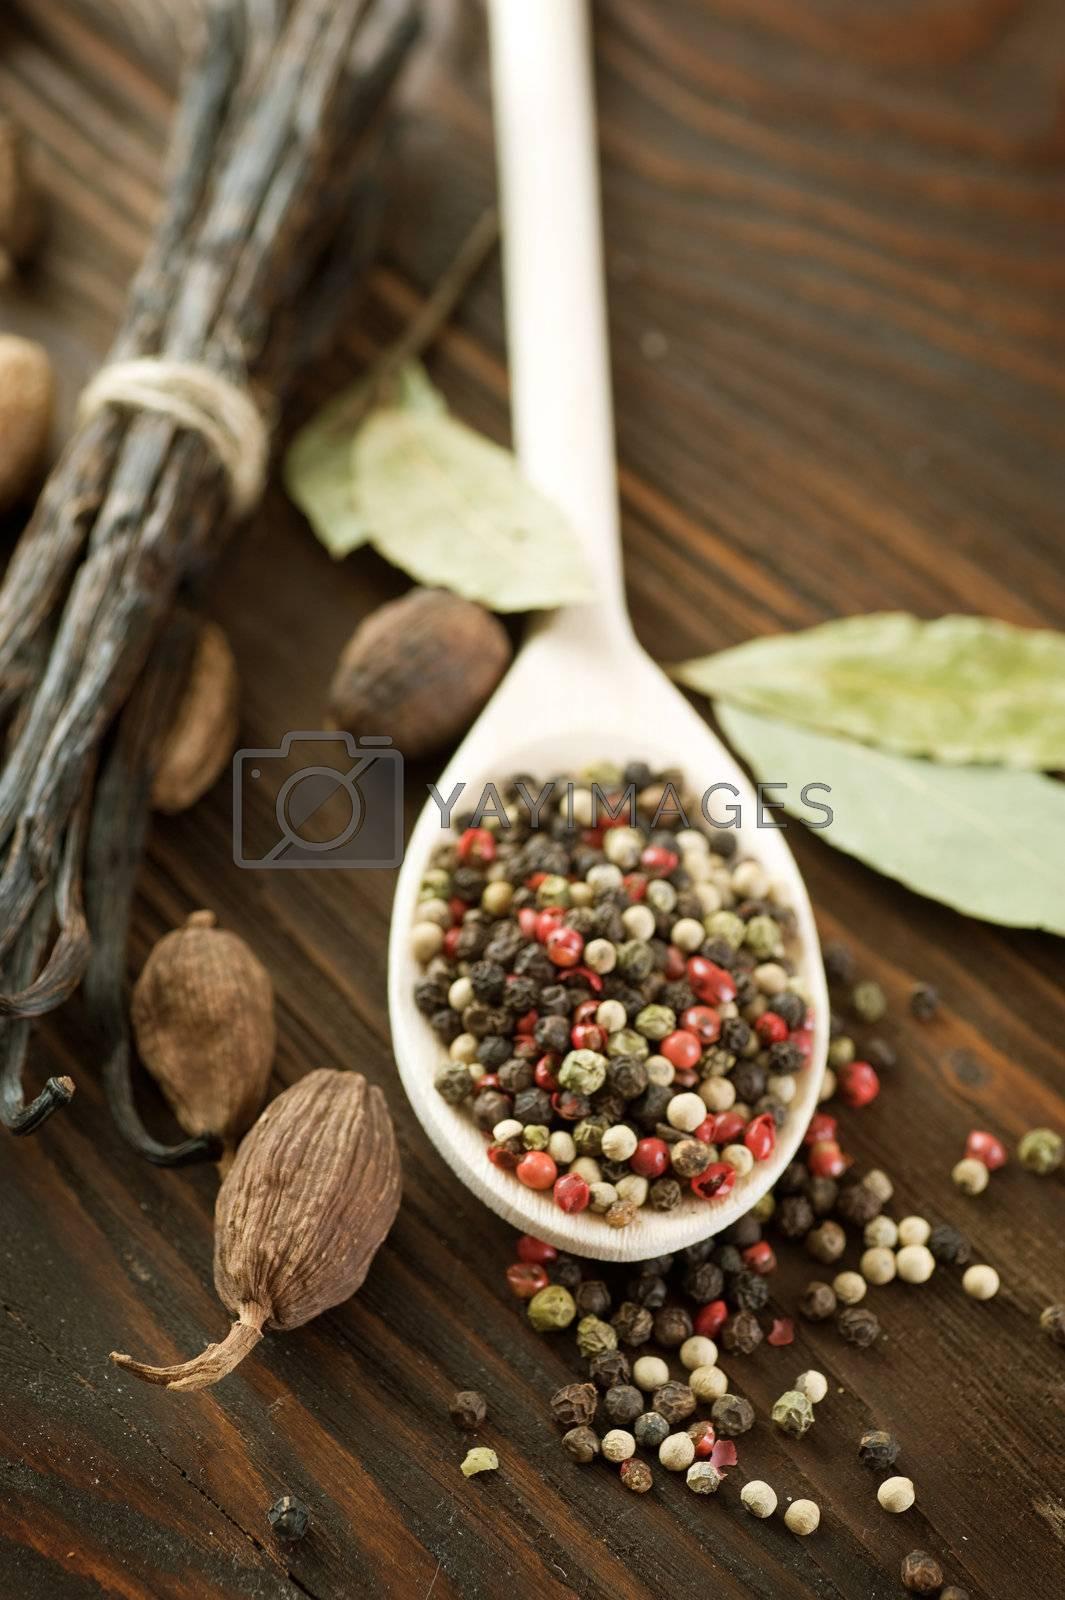 Spices Closeup by Subbotina Anna